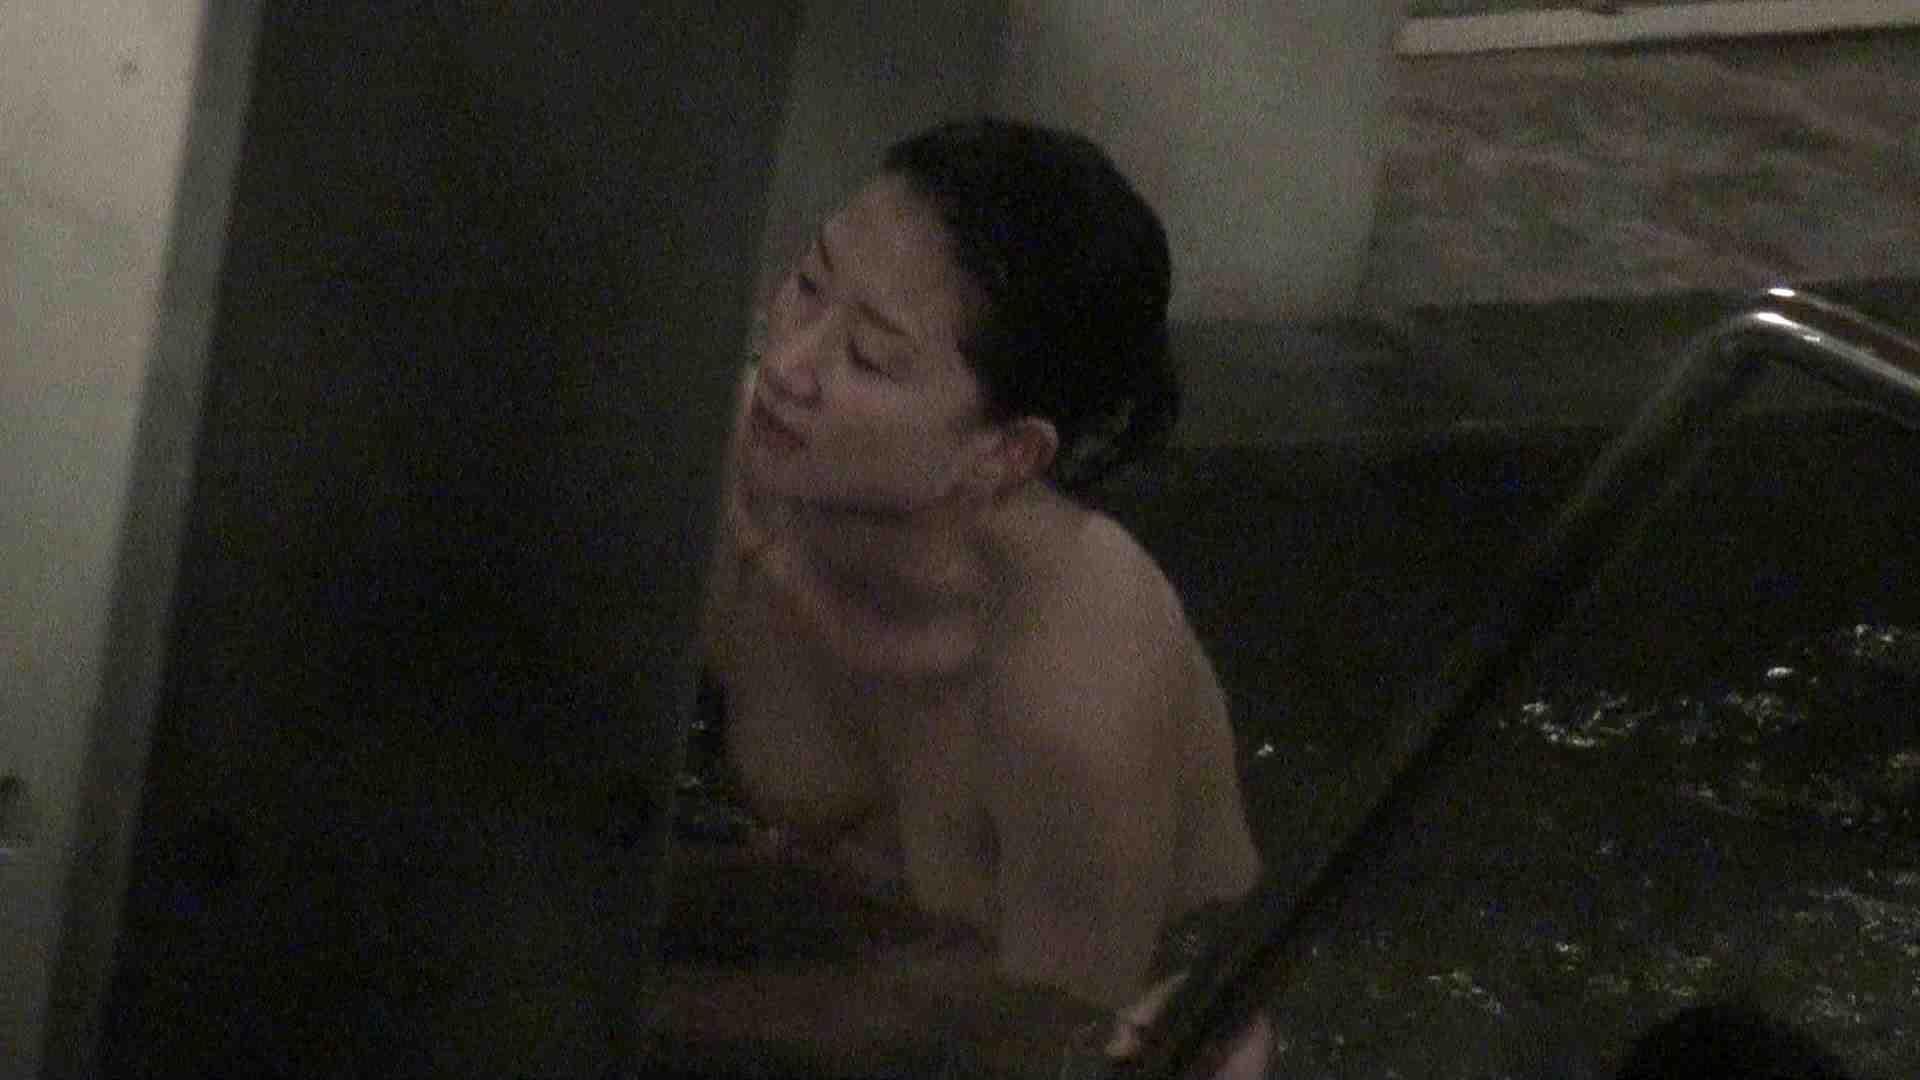 Aquaな露天風呂Vol.366 OLセックス  58画像 45